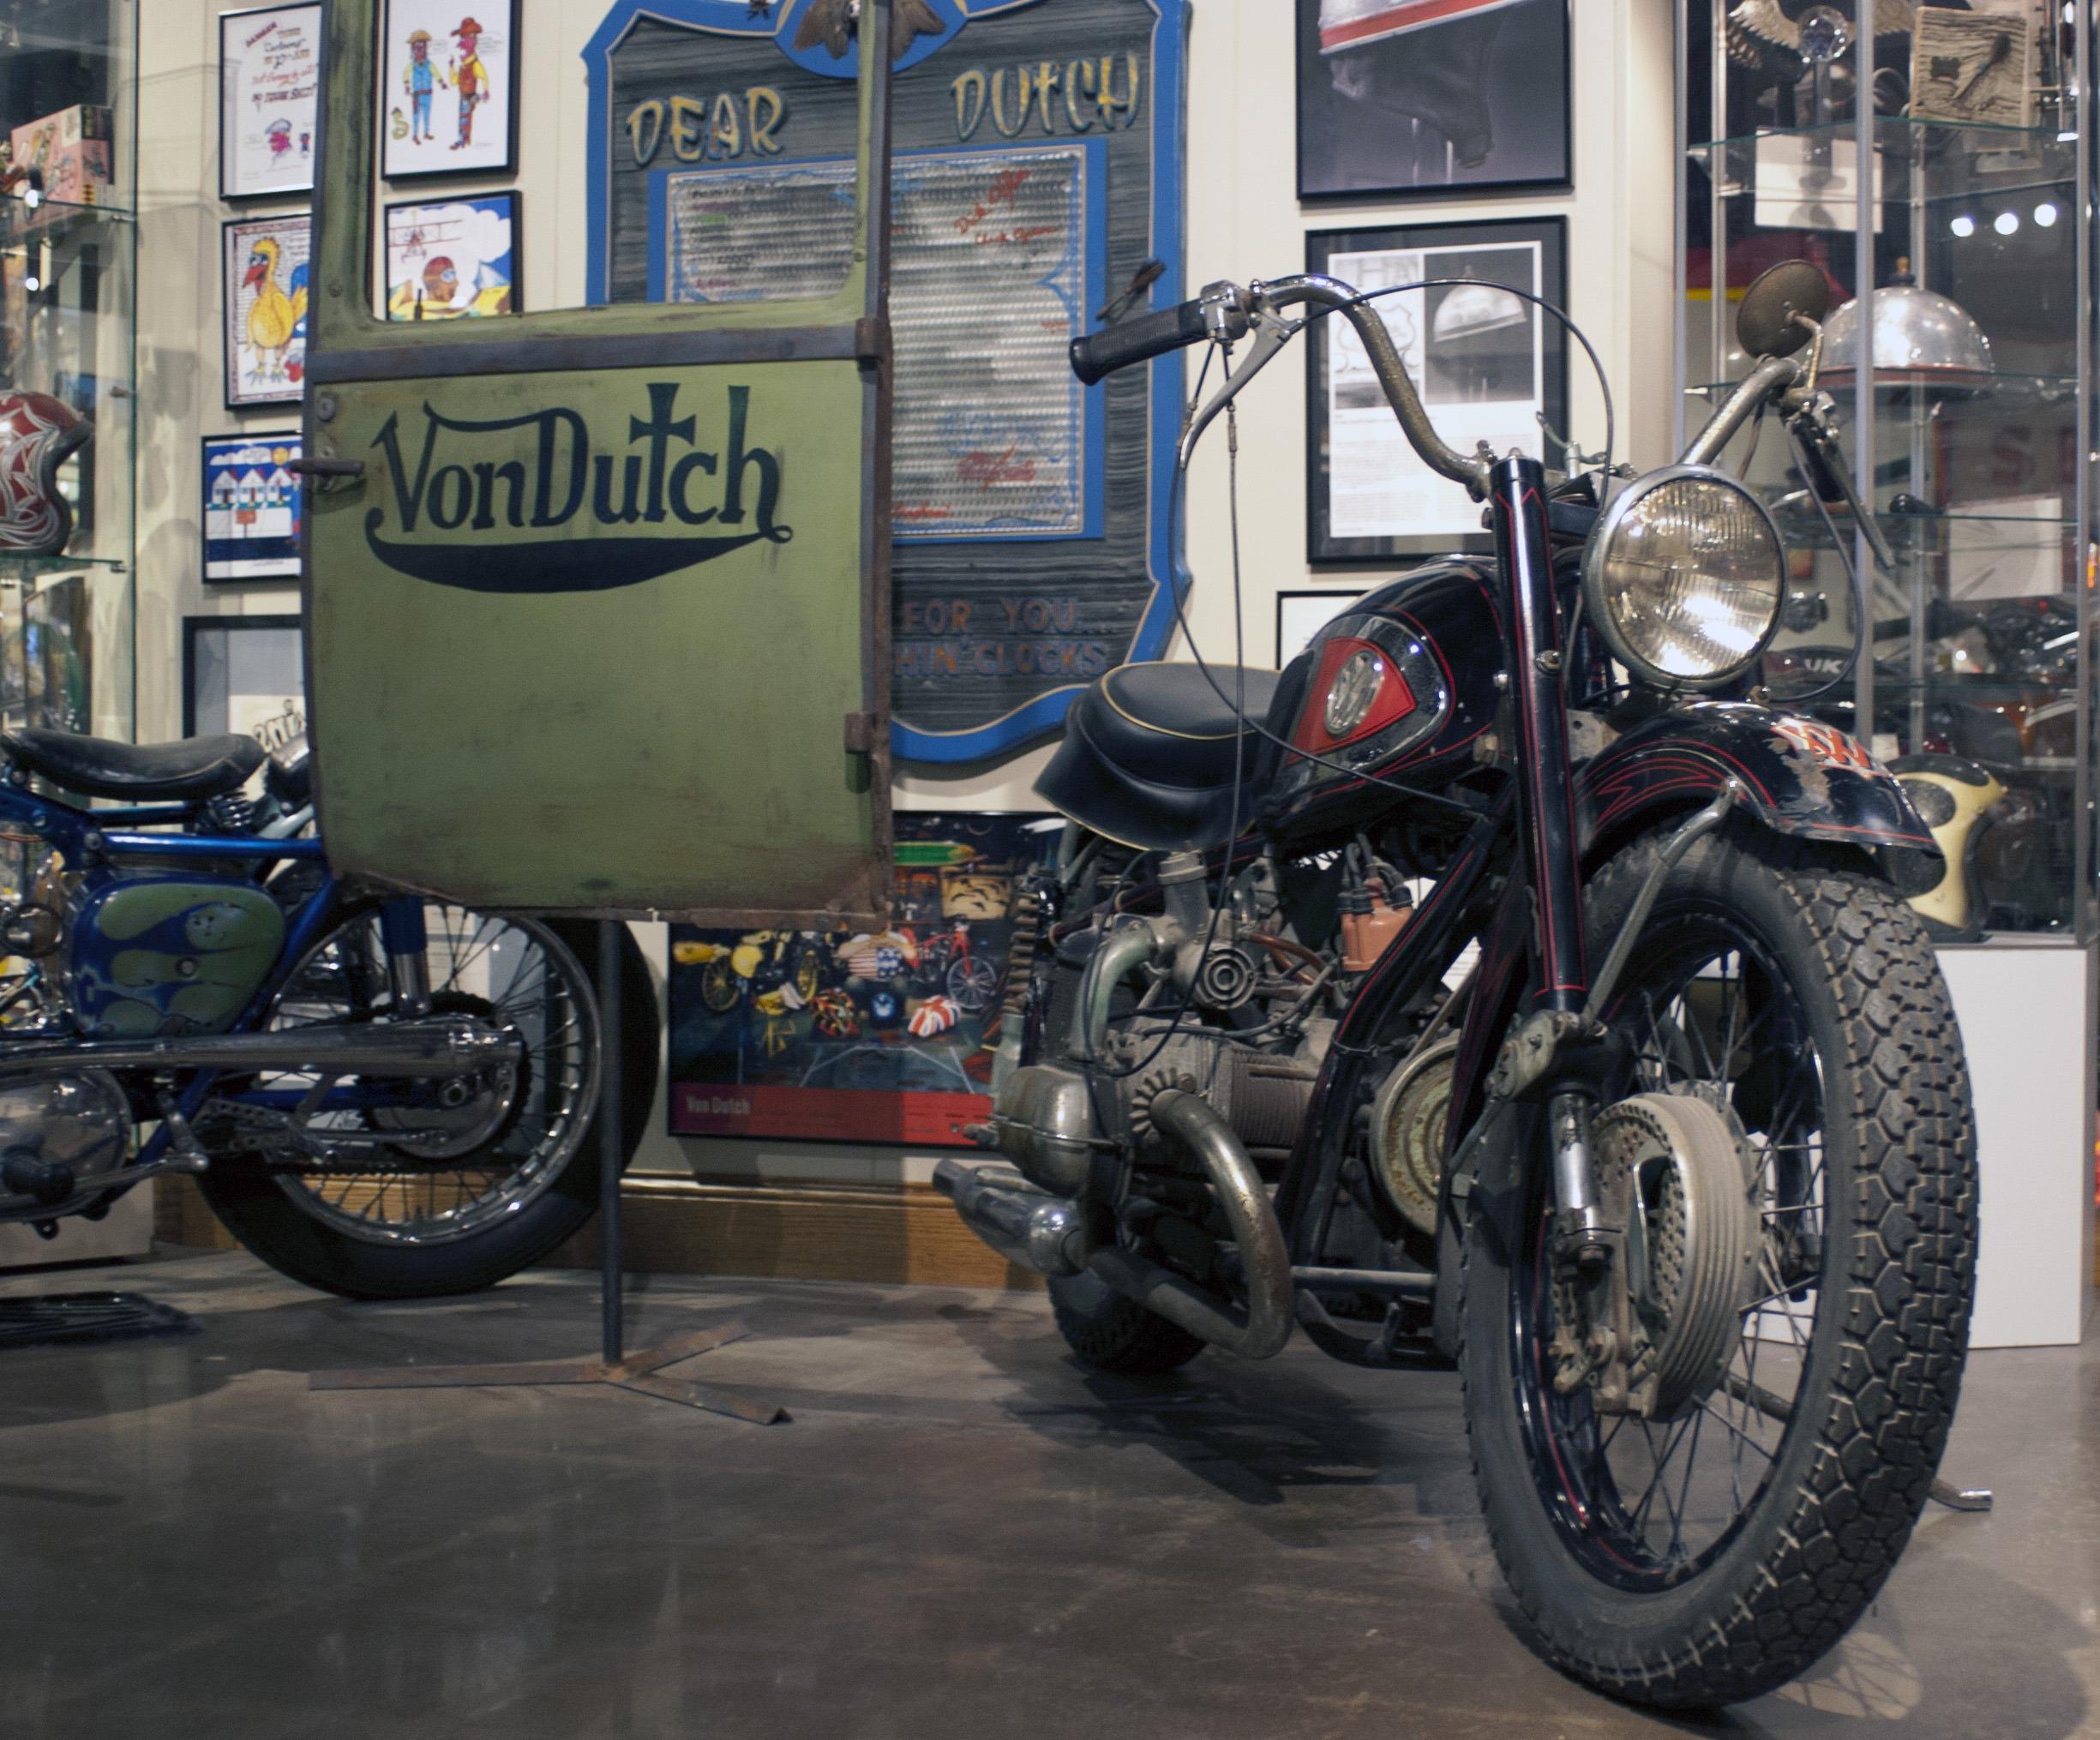 American Pickers Vondutch Xavw Hits Museum National Motorcycle